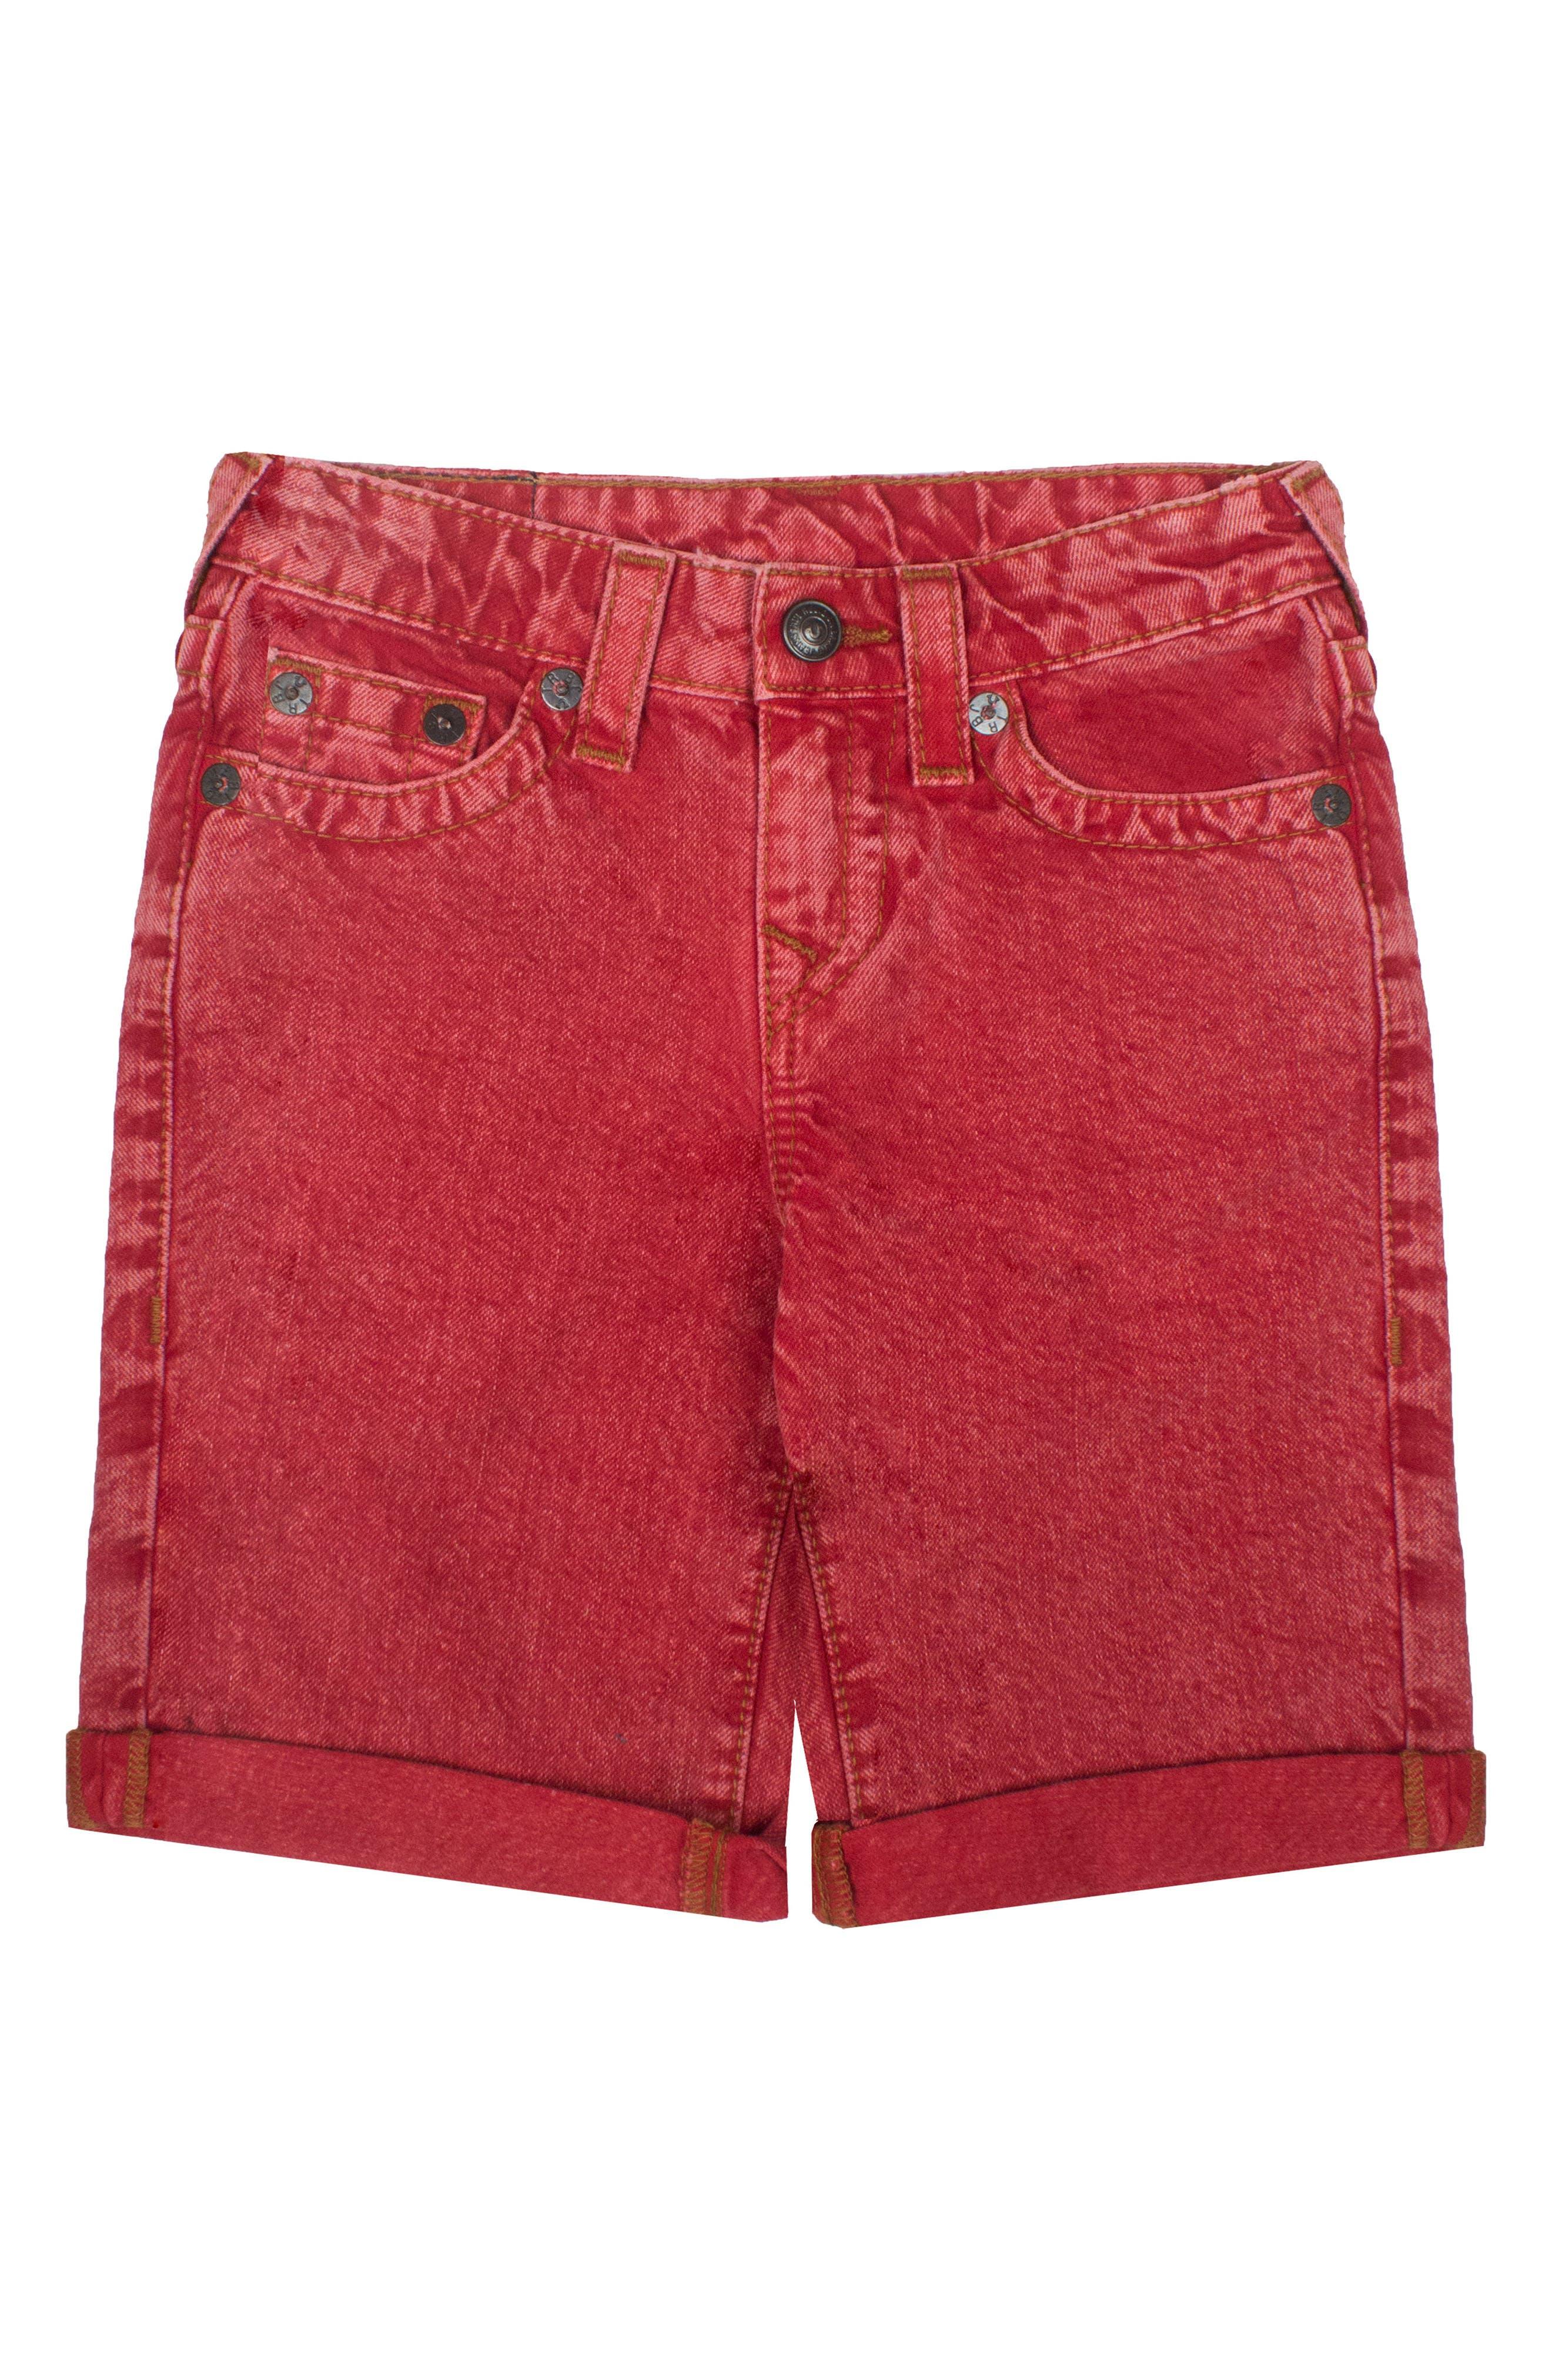 True Religion Brand Jeans Geno Denim Shorts (Toddler Boys & Little Boys)